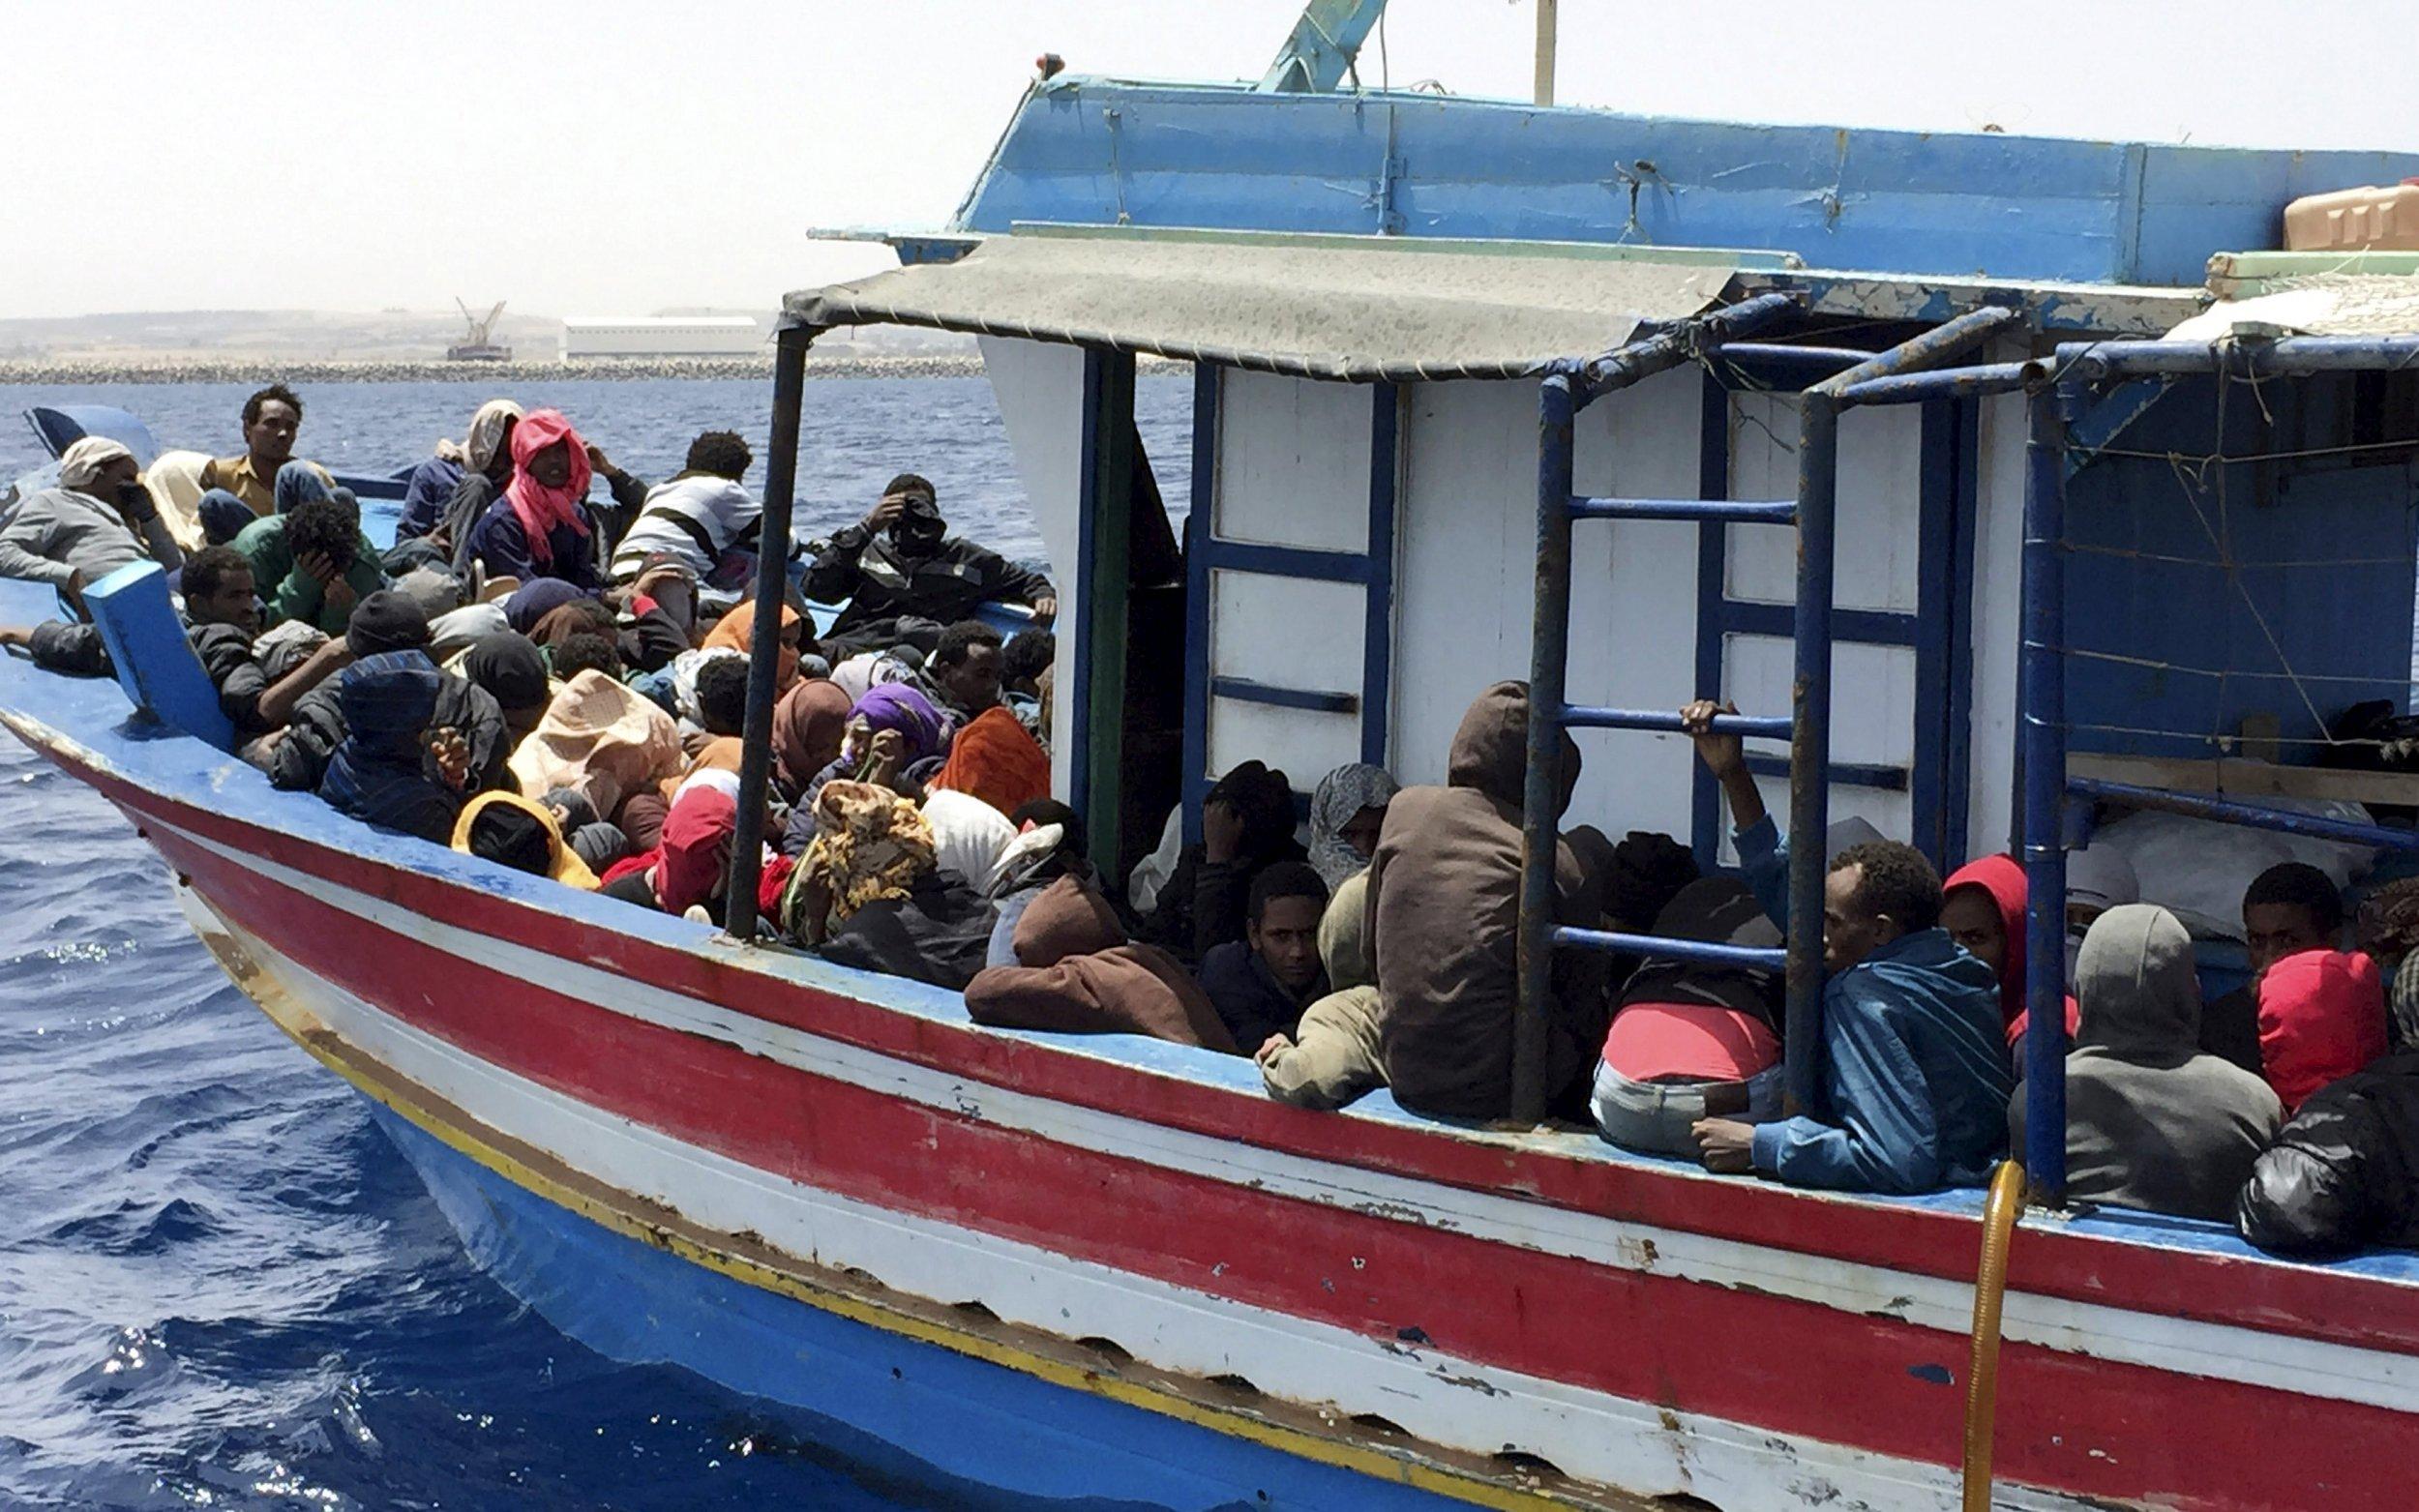 2015-05-06T183219Z_107683798_GF10000086150_RTRMADP_3_EUROPE-MIGRANTS-LIBYA